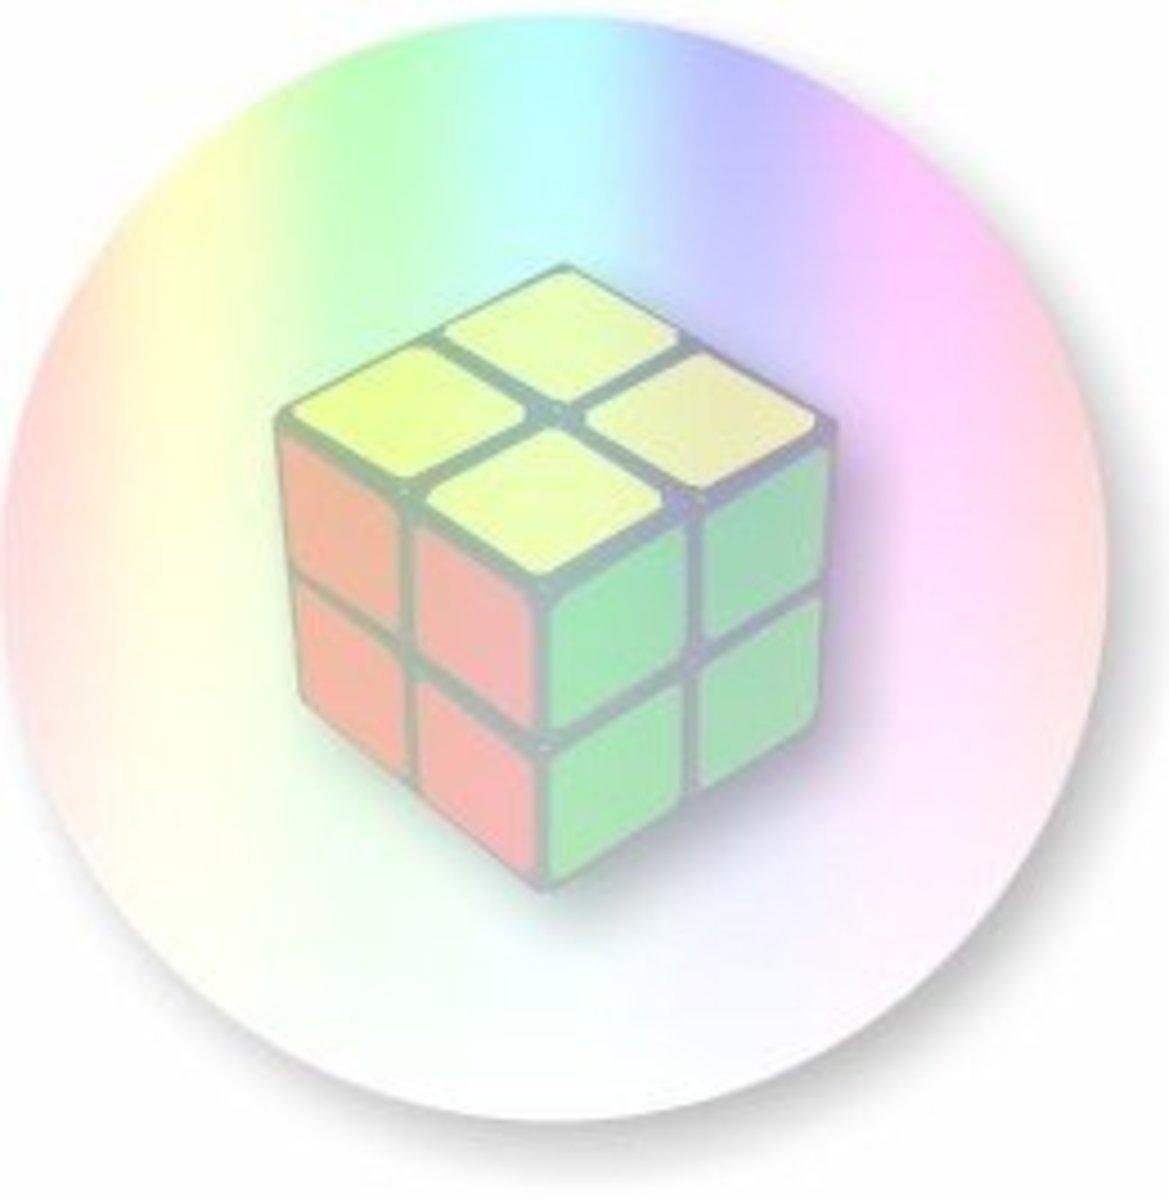 How To Solve A 2x2x2 Rubiks Cube - Mini Cube - 2x2 Rubik's Cube Solution